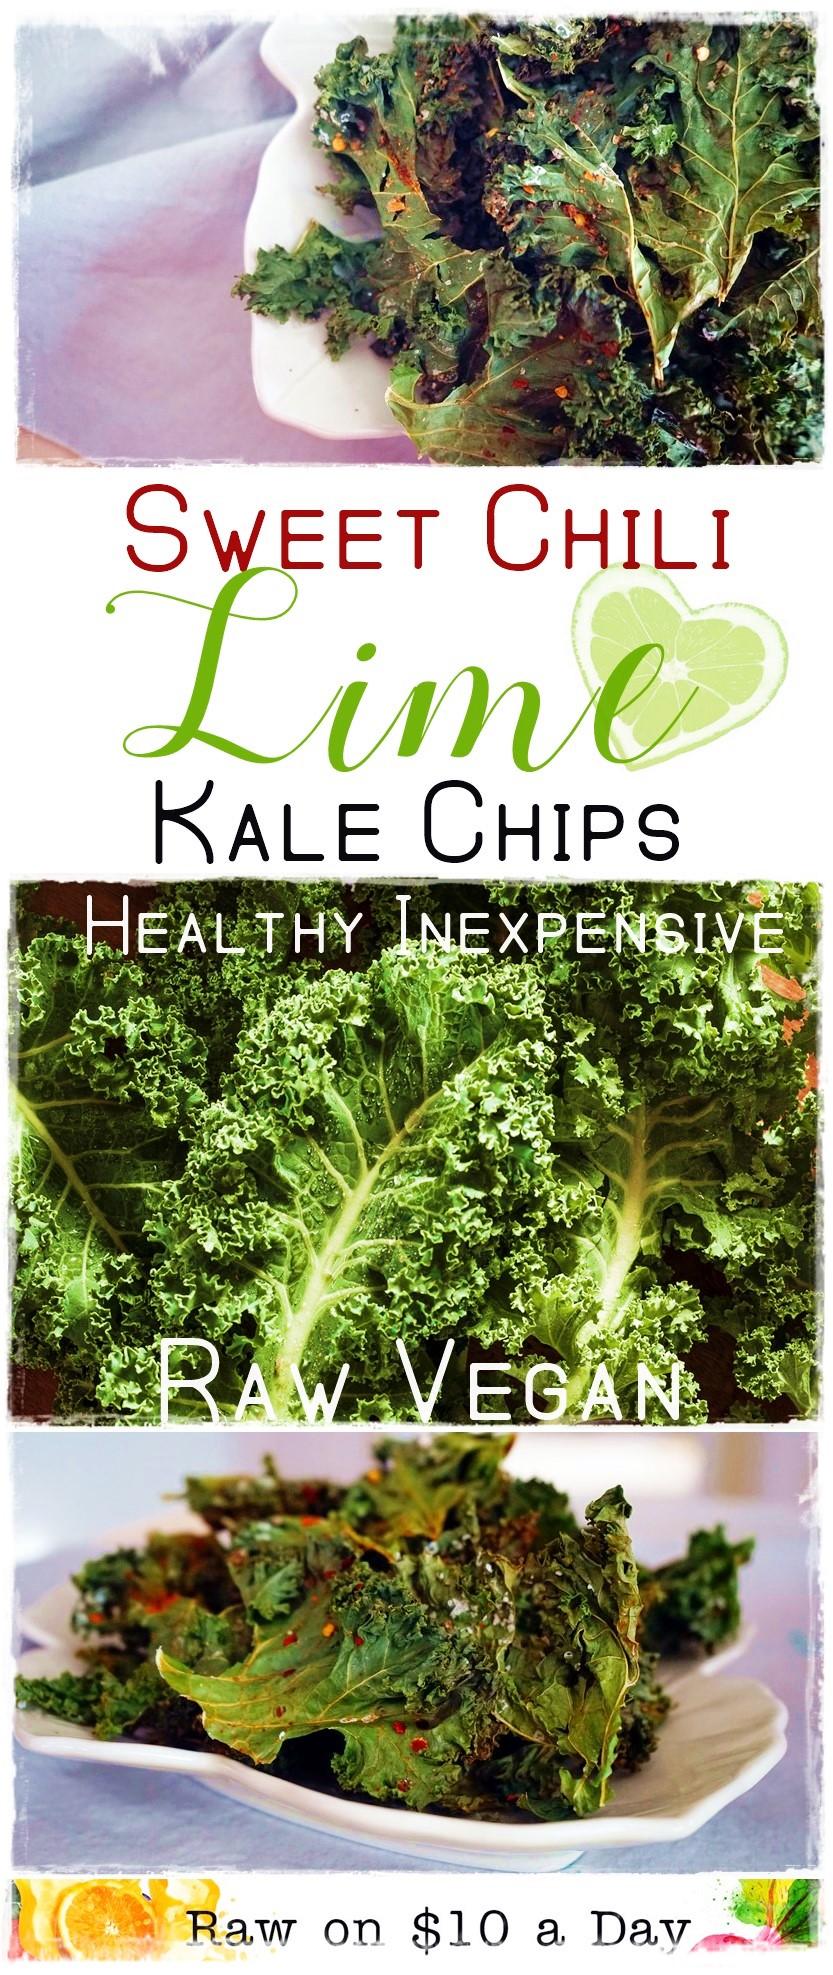 Sweet Chili Lime Kale Chips Oil Free Raw Vegan Healthy Raw on 10 #vegnrecipe #rawkalechips #rawfood #oilfreevegan #chililimekalechips #dehydratorkalechips PIN IT